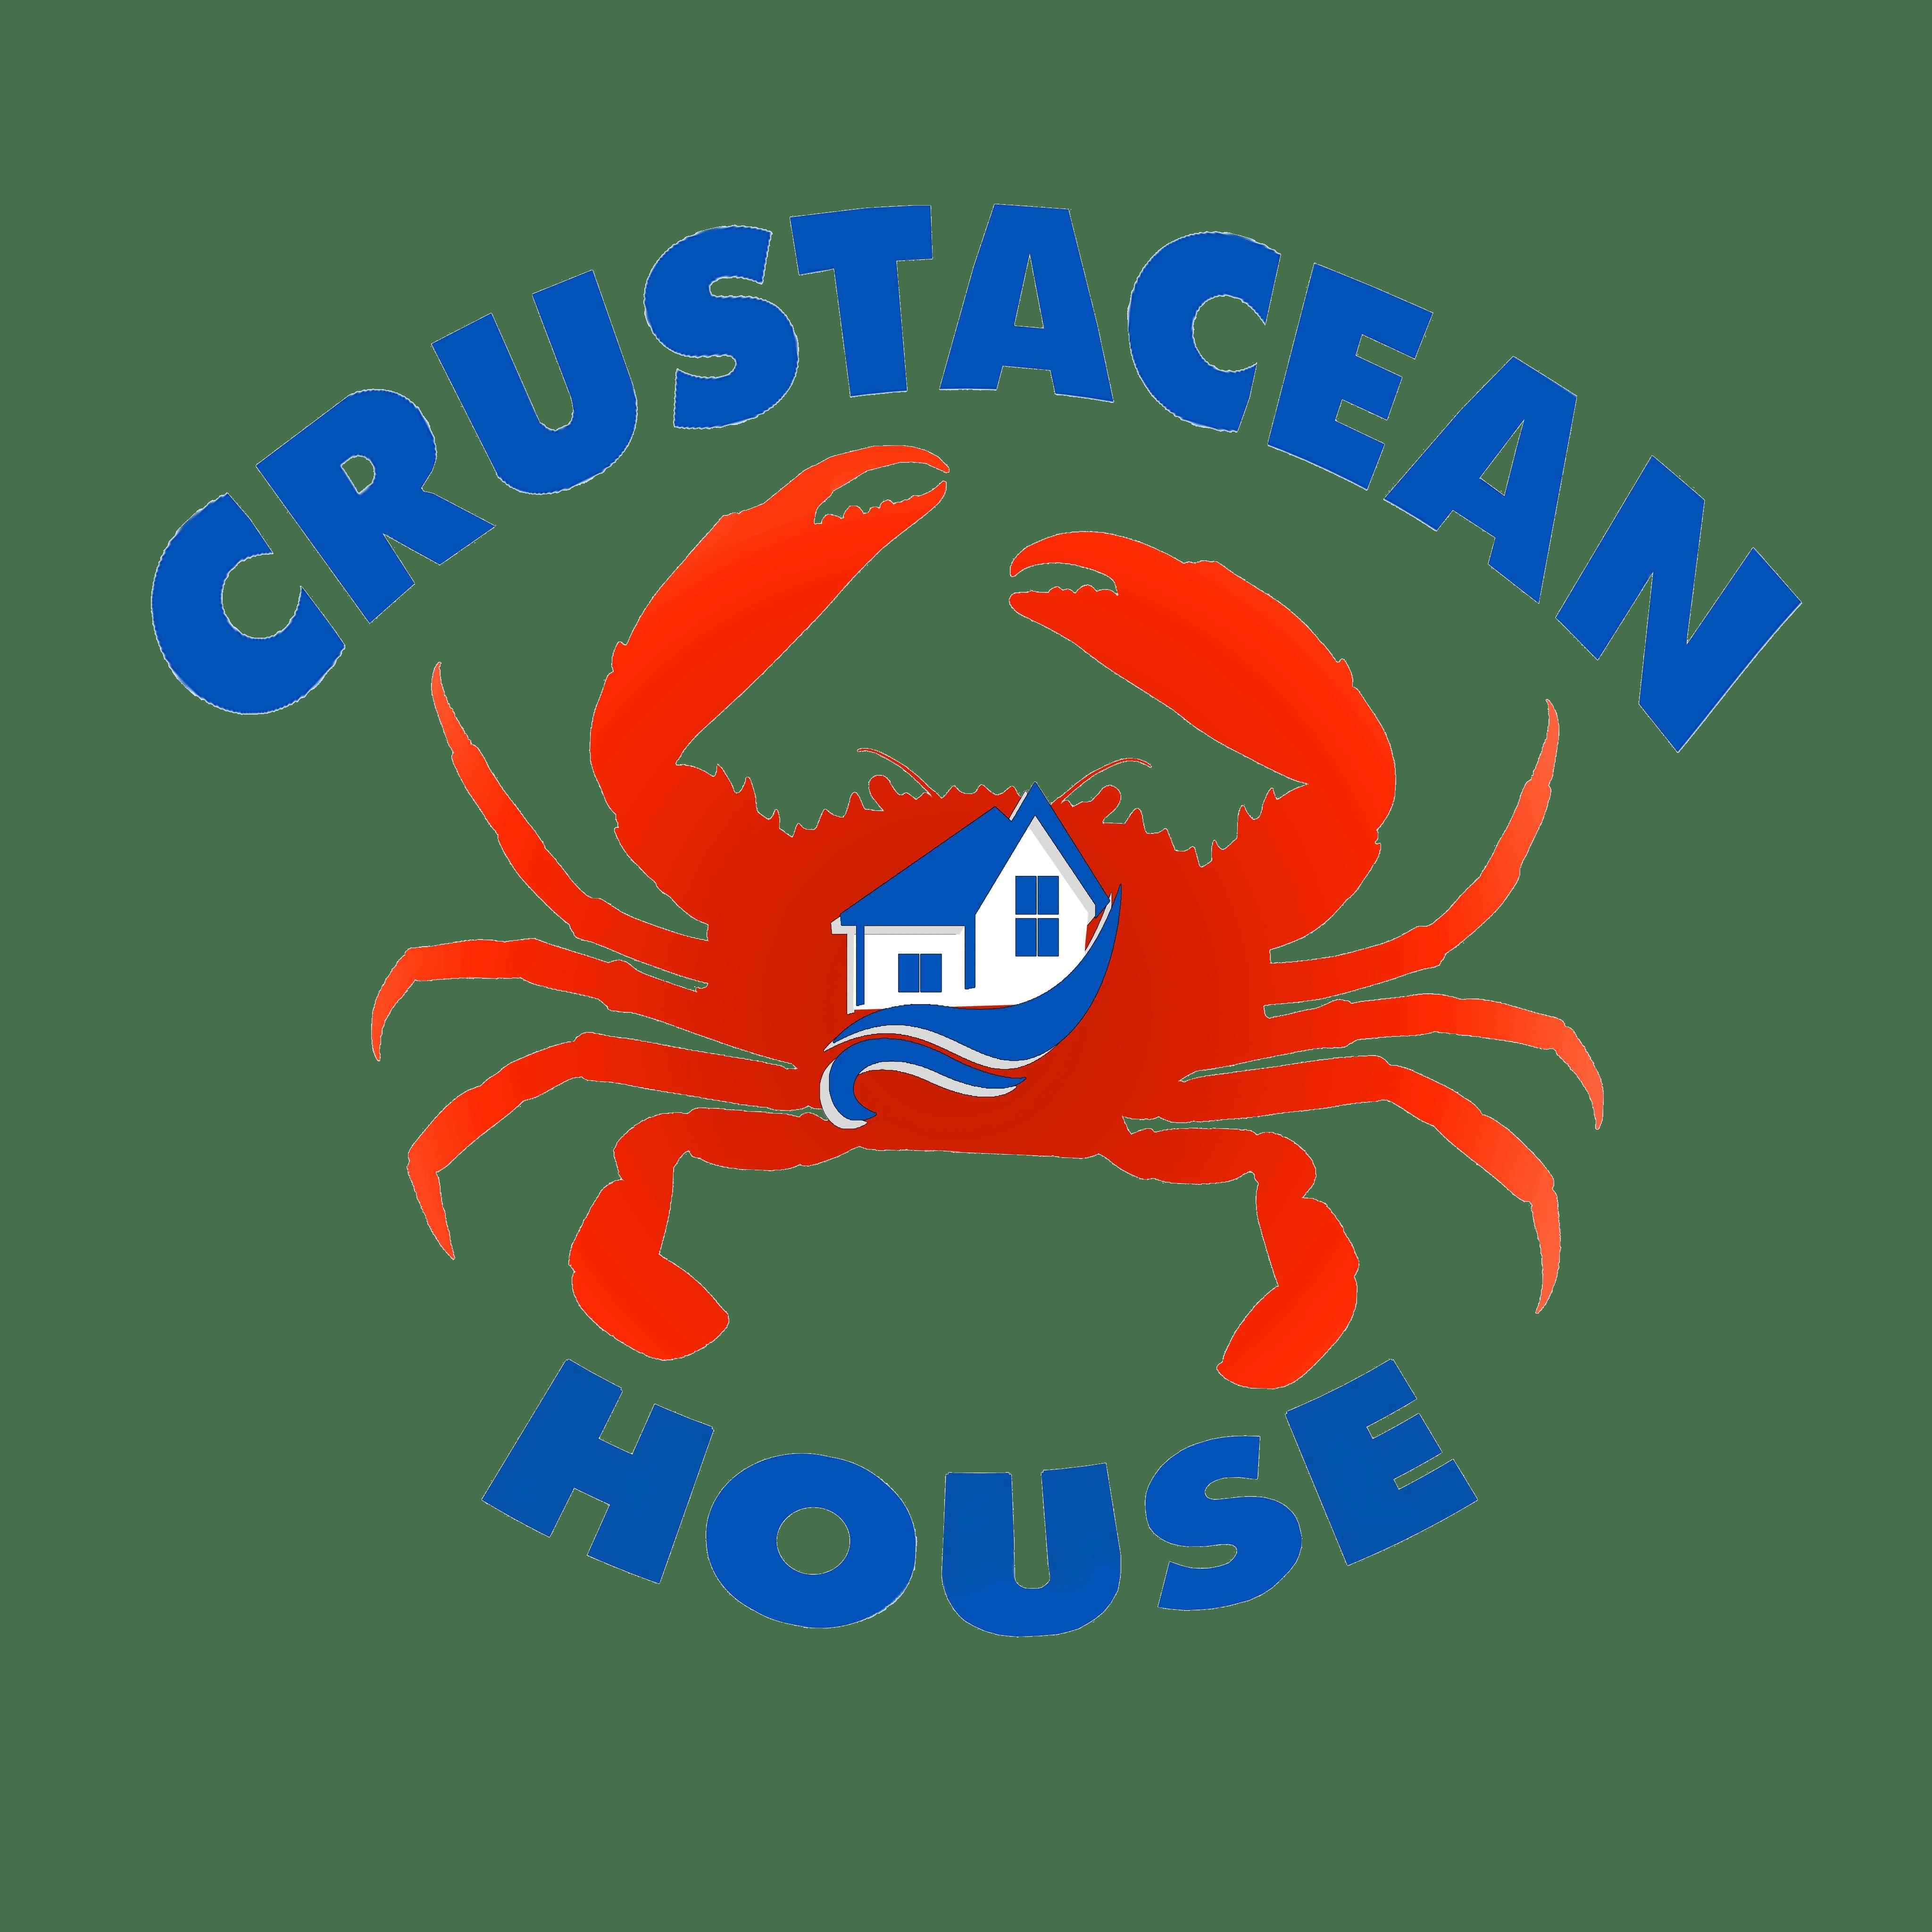 Crustacean House